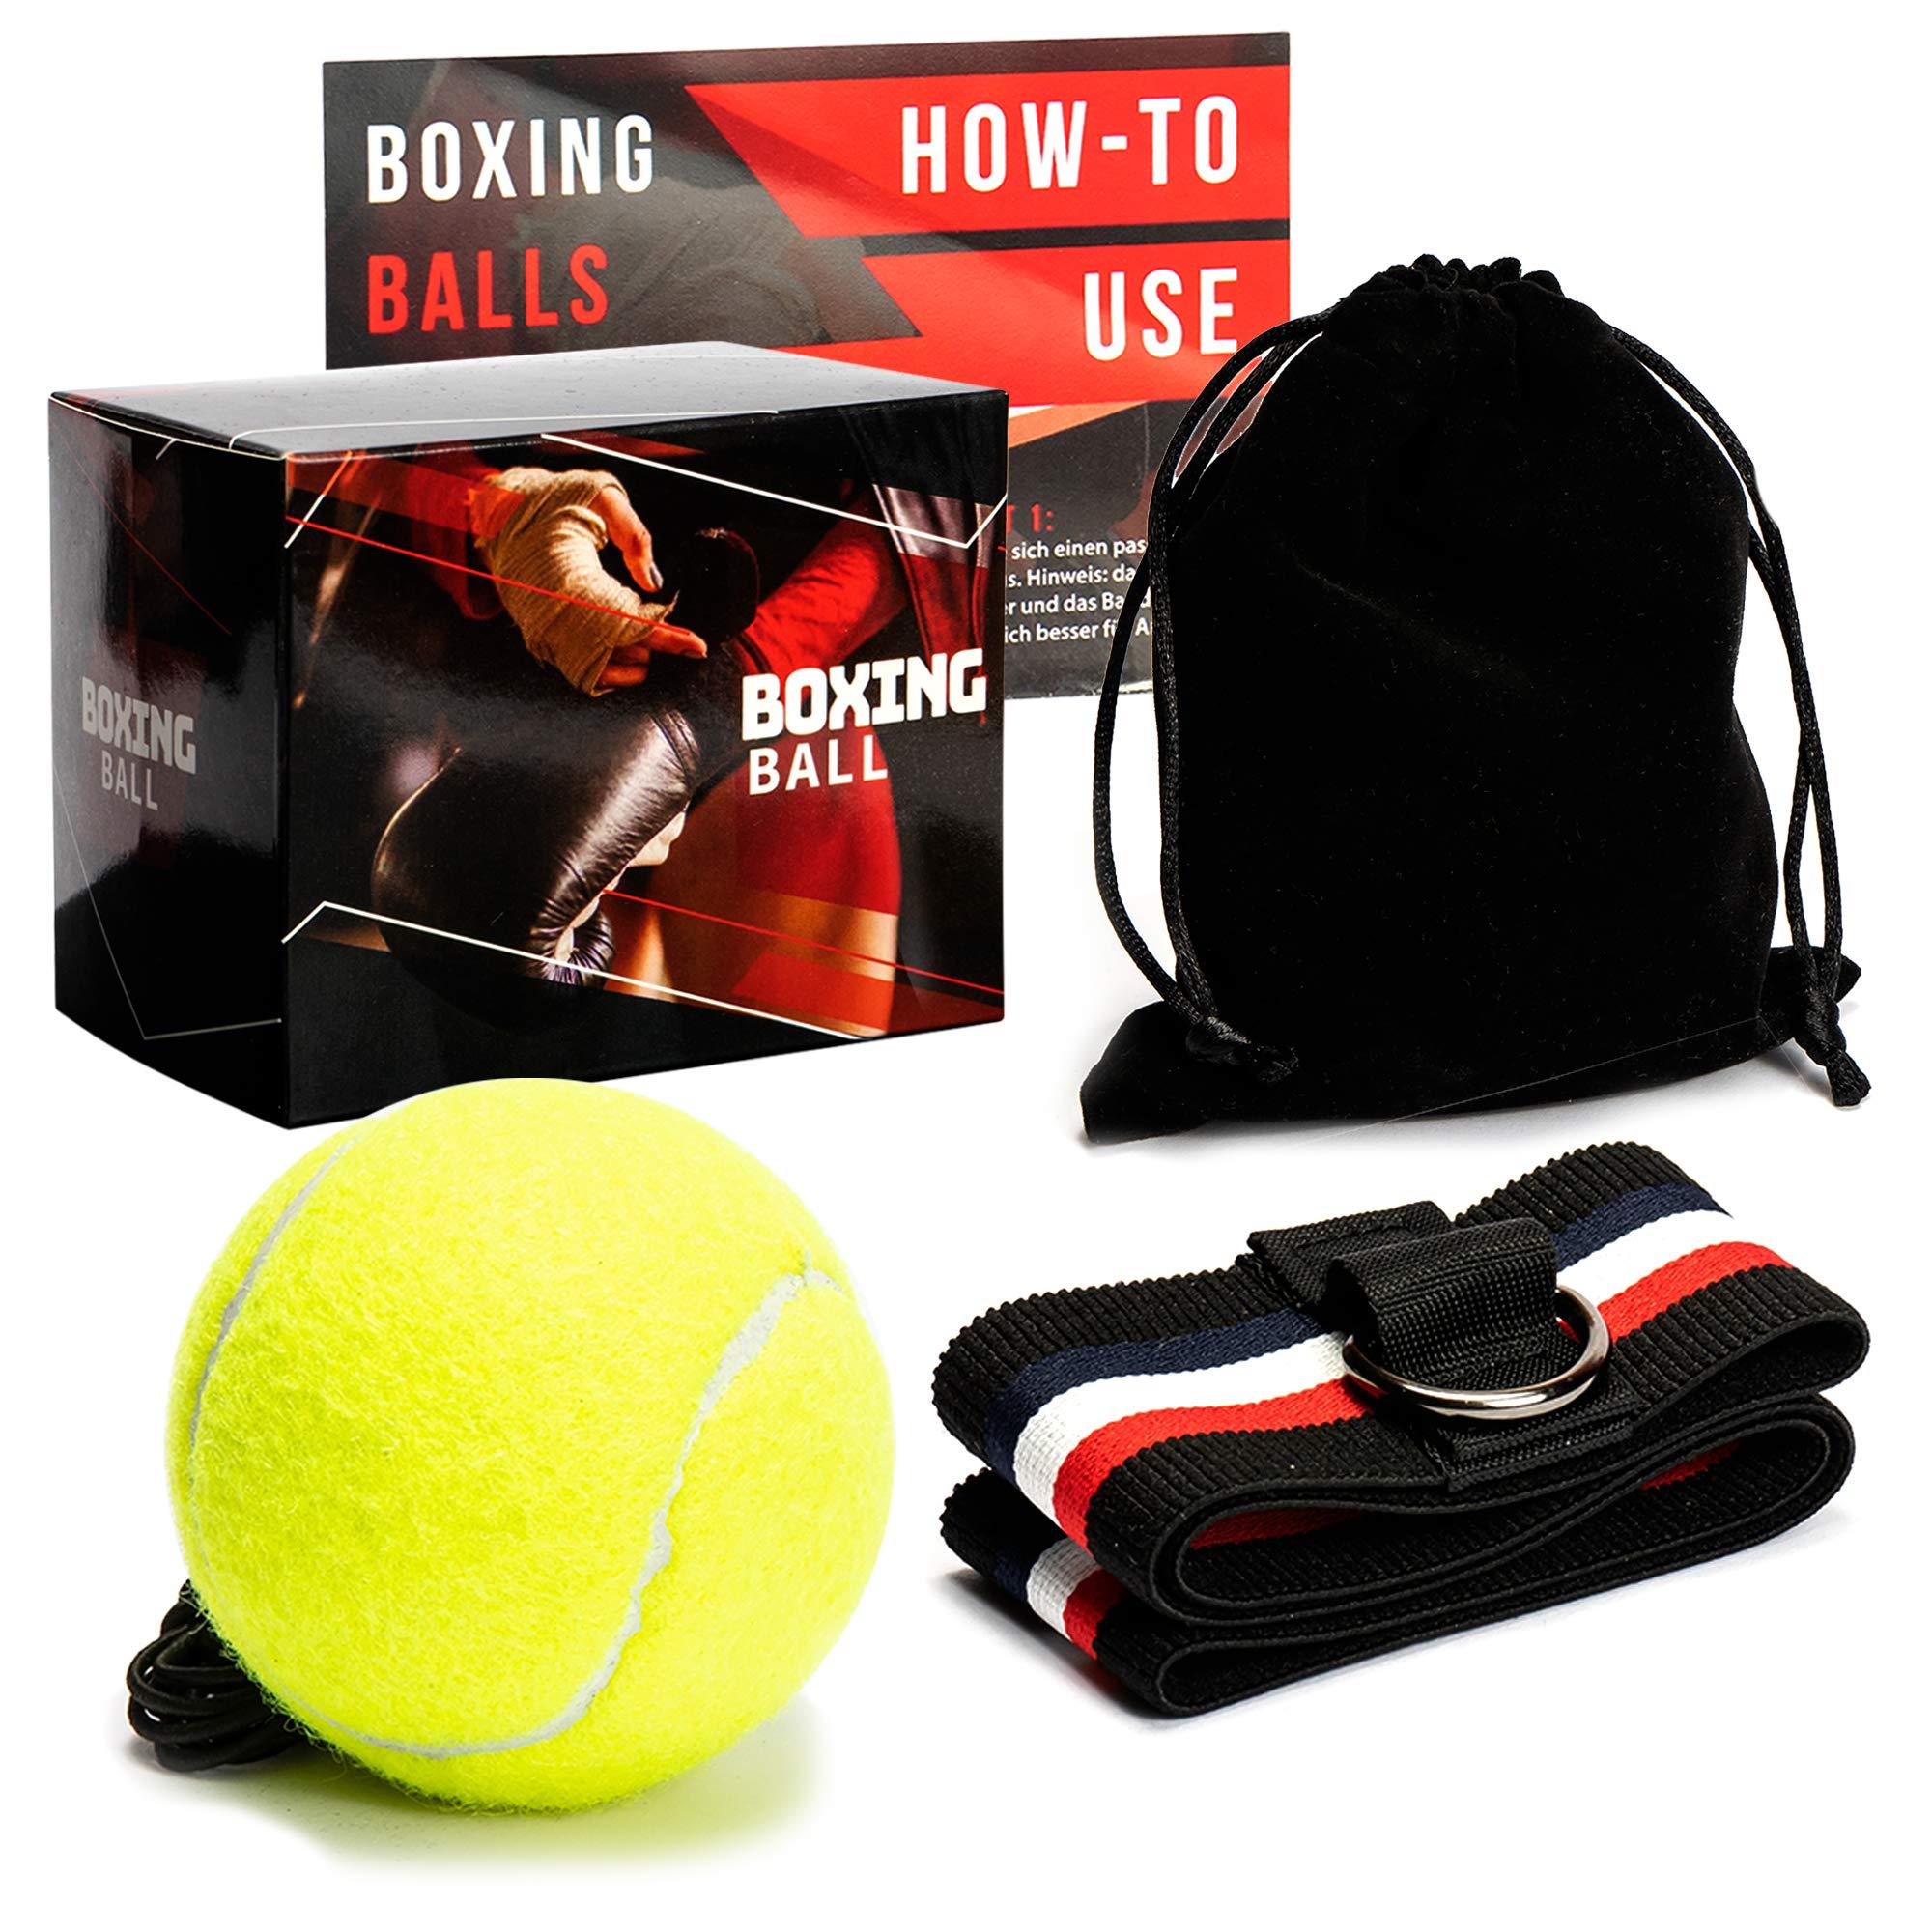 Loomiloo Reflex Box Ball con cinta para la frente, perfecto ...